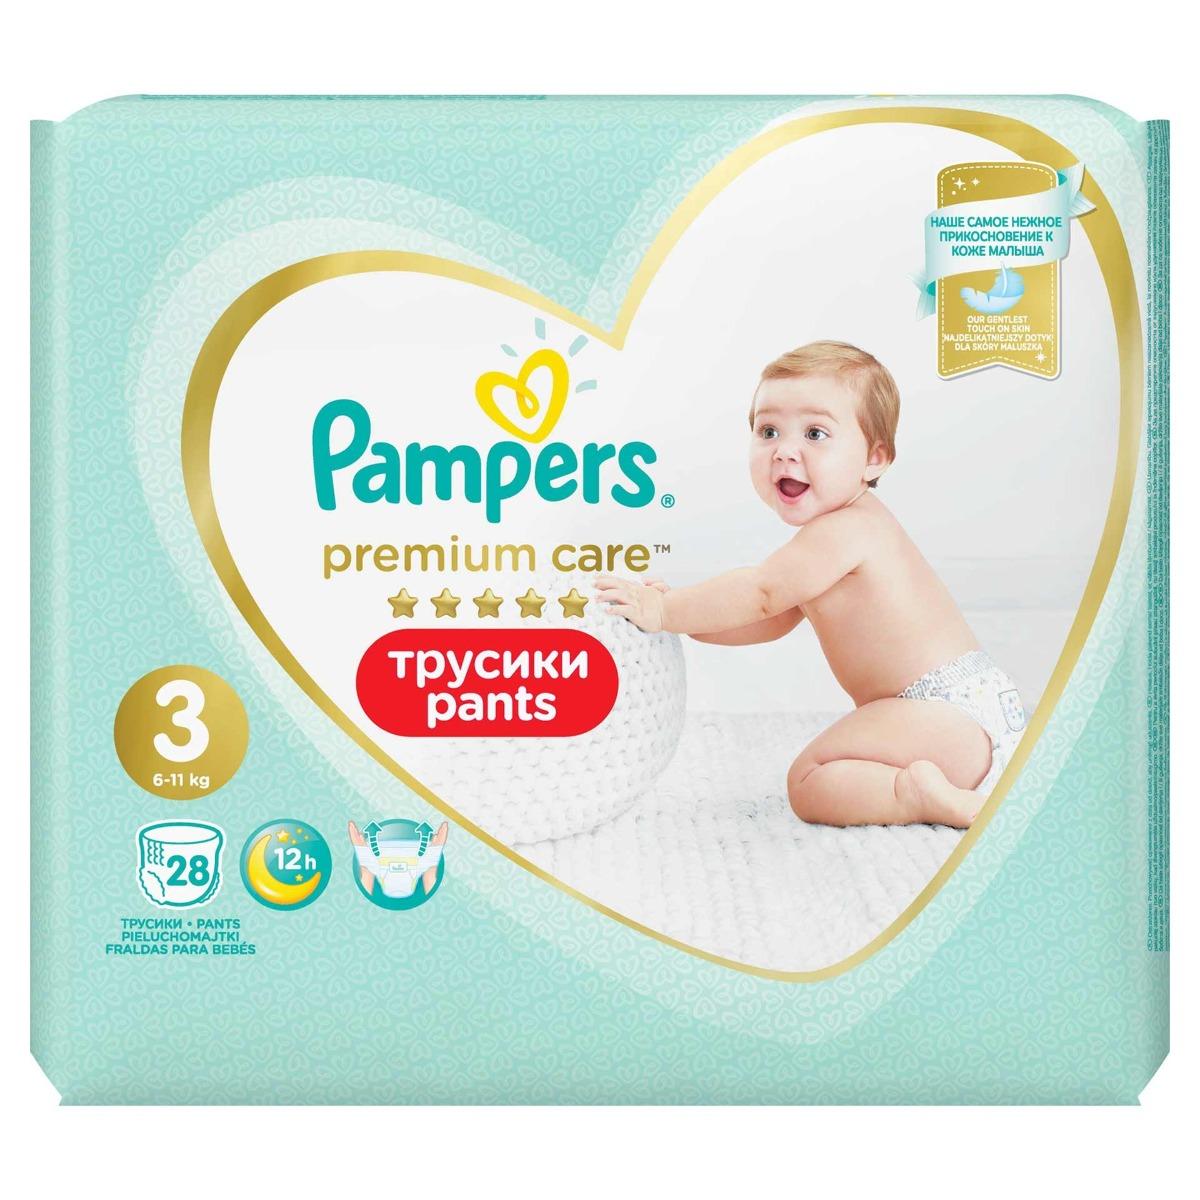 Scutece chilotel Premium Care Pants Carry Pack marimea 3 Midi pentru 6-11 kg, 28 bucati, Pampers drmax.ro